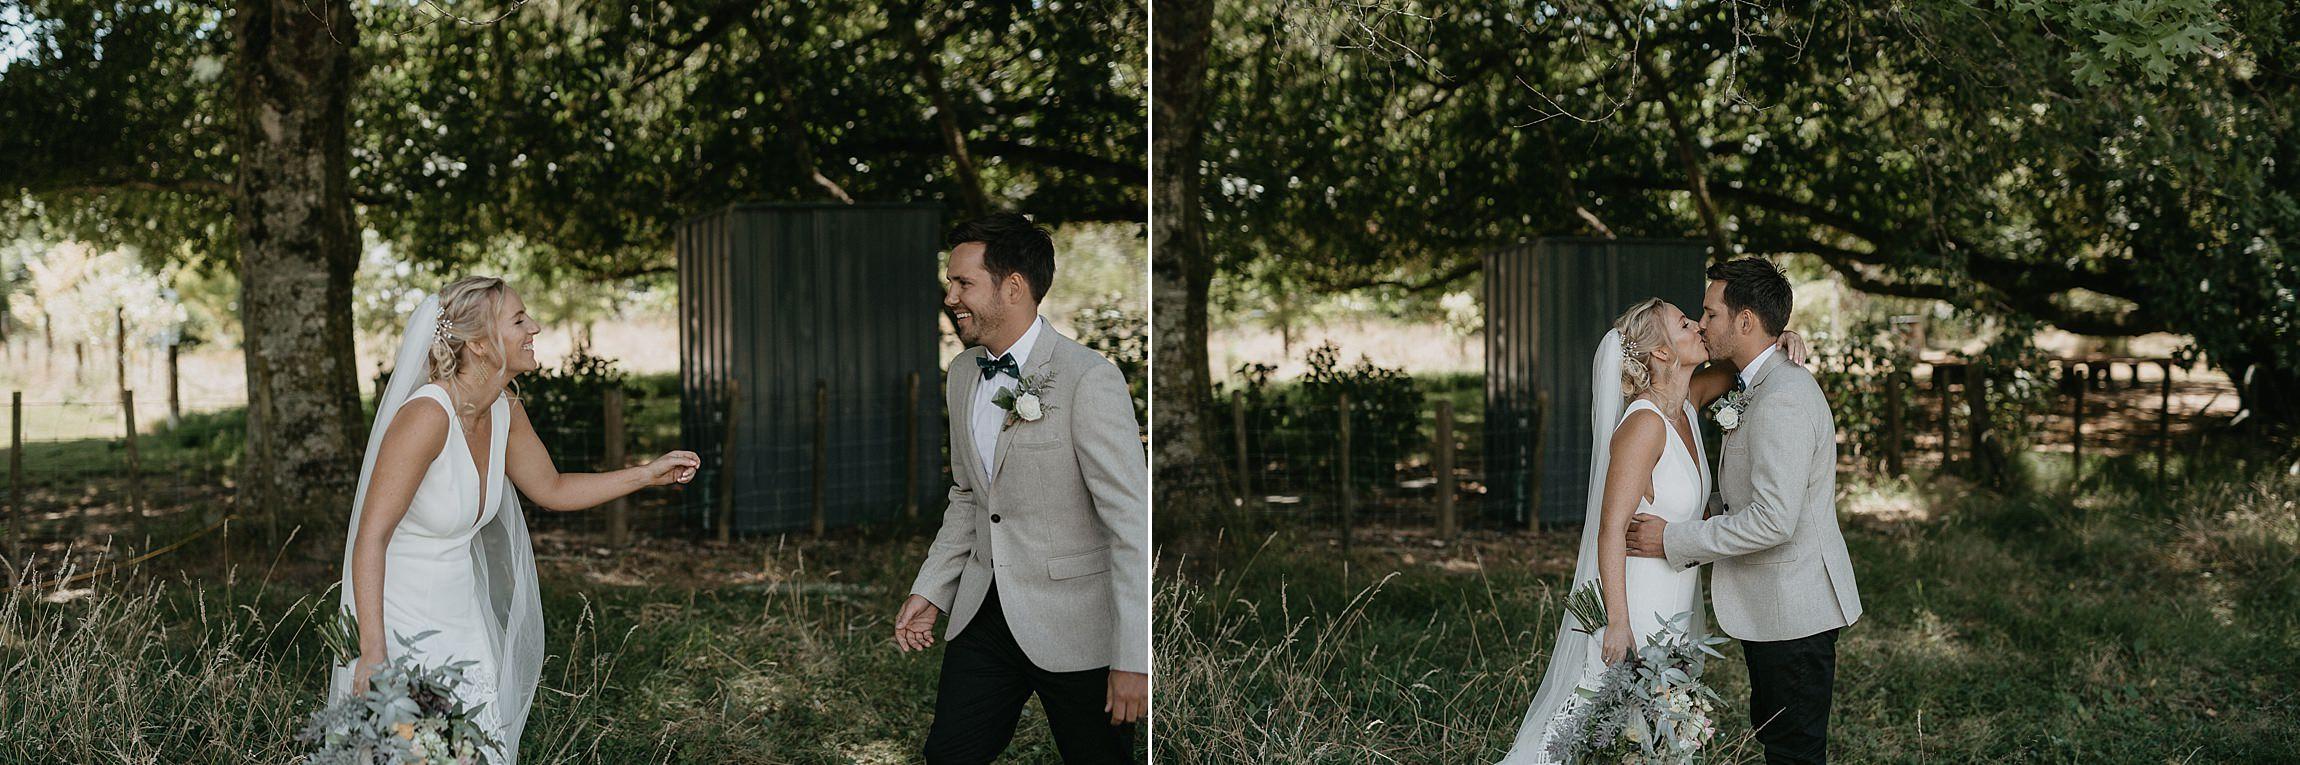 oldforestschool-wedding-blog-54.jpg